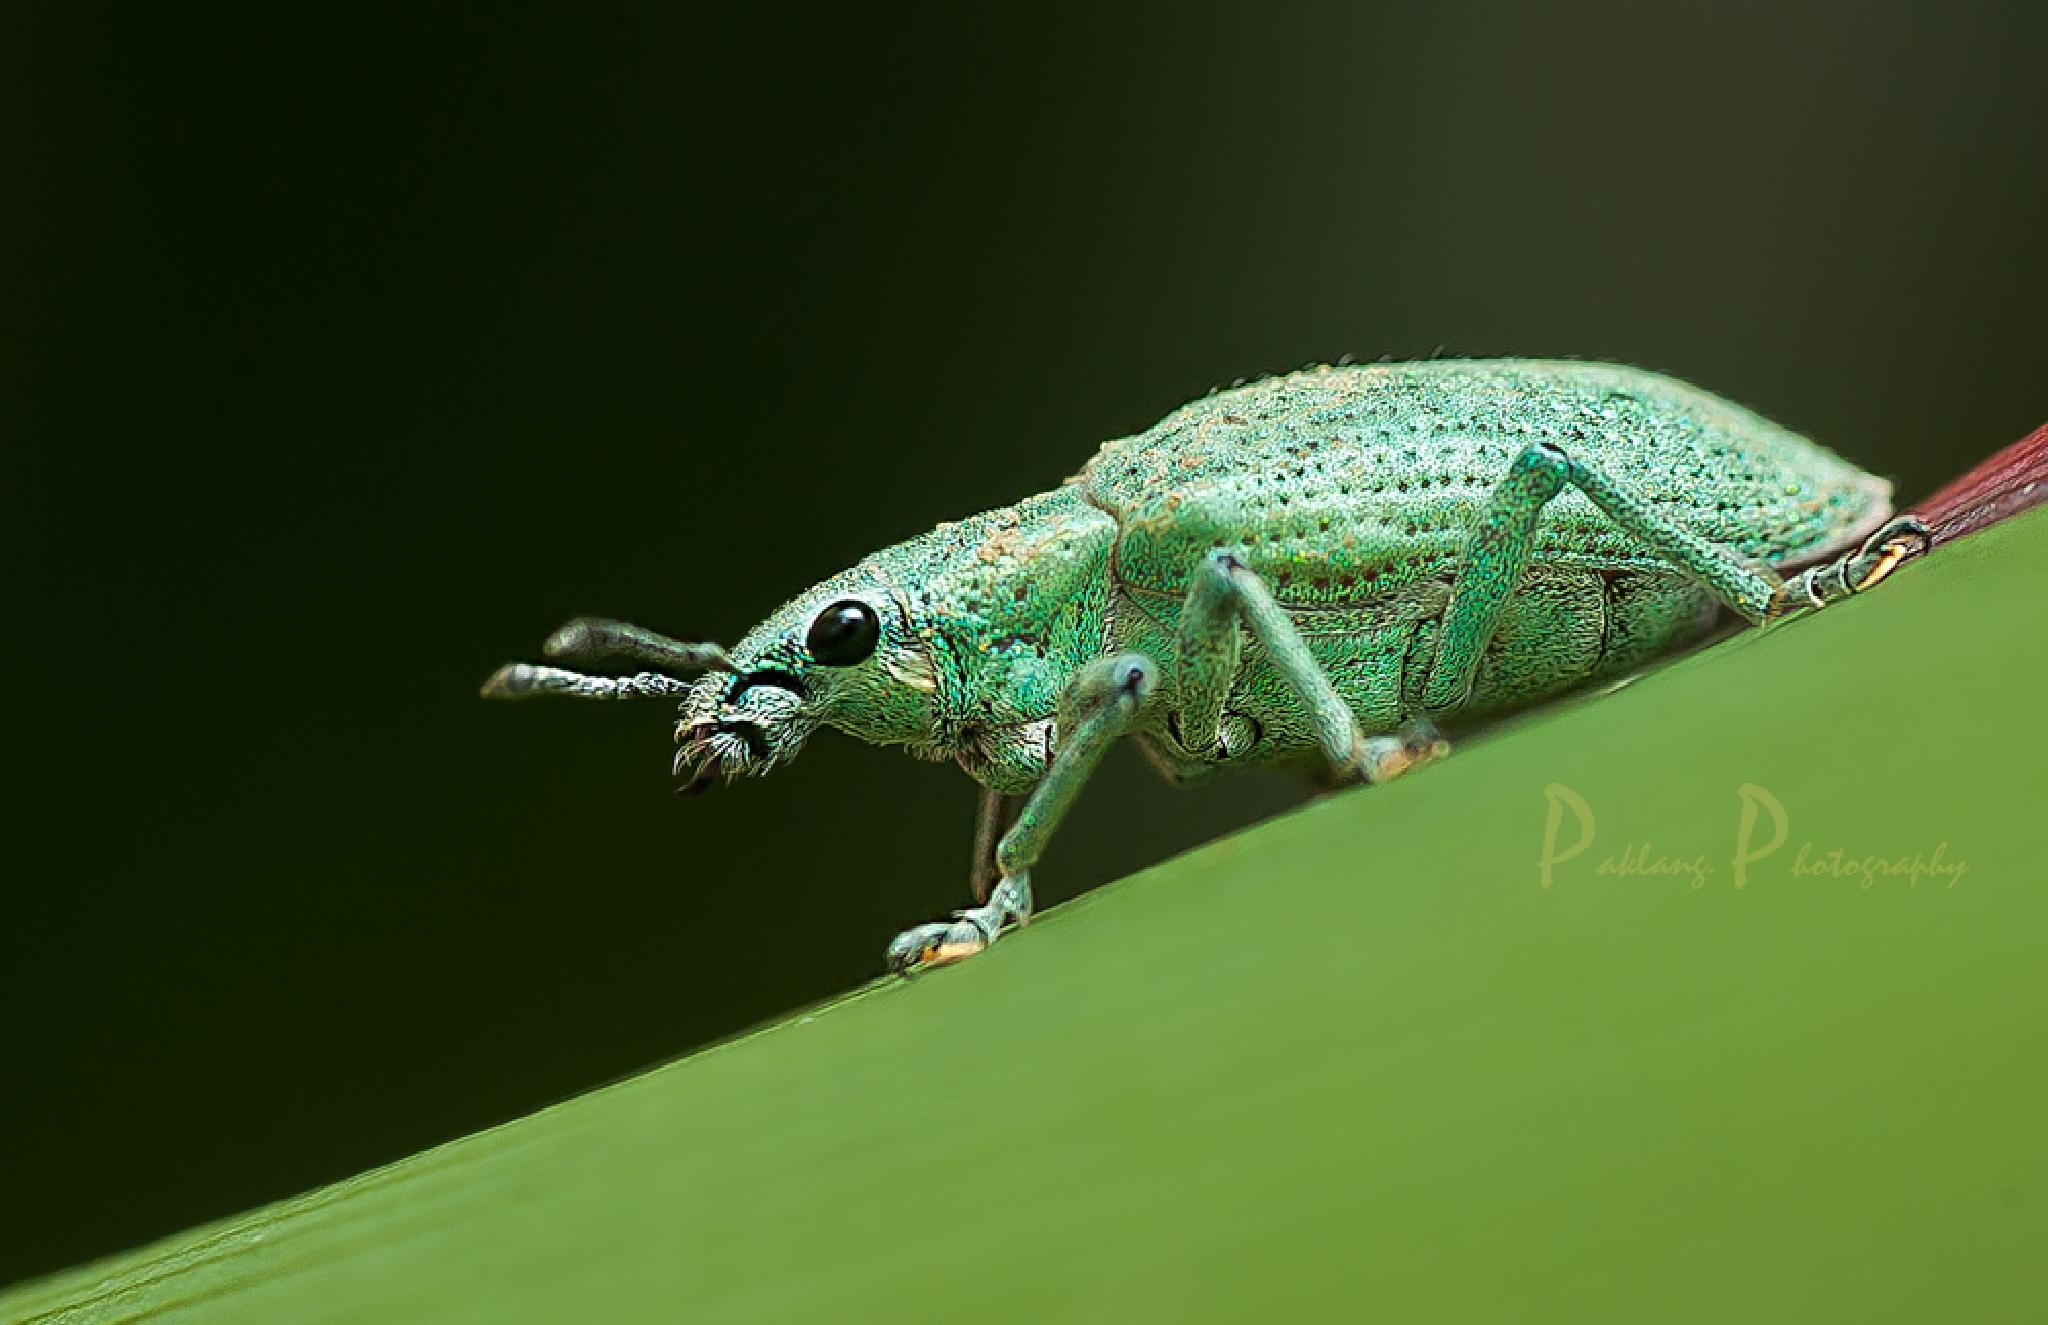 Turn Green by Paklang